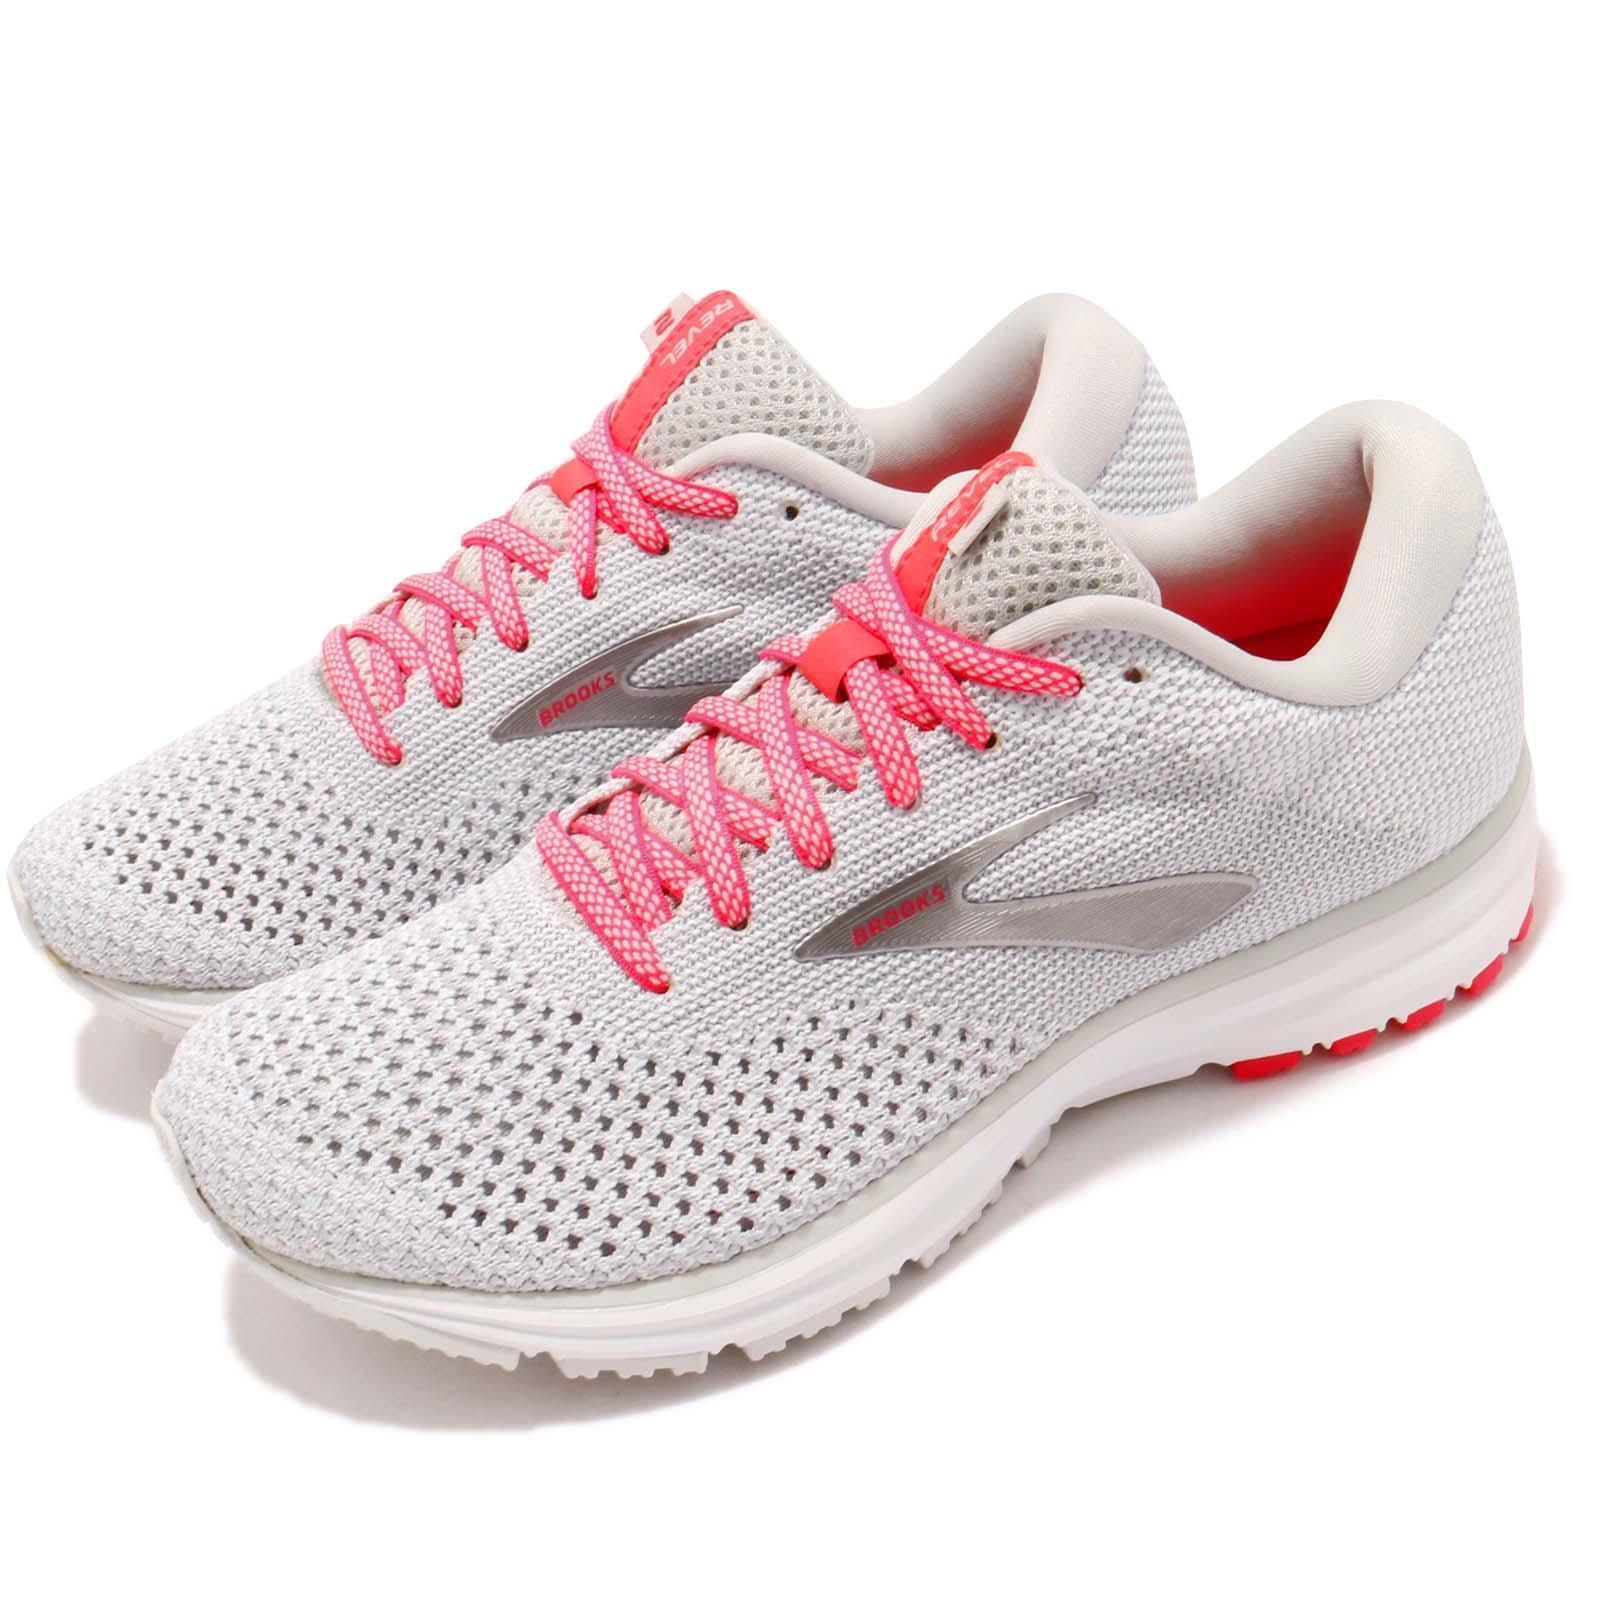 Brooks Revel 2 Grey White Pink Women Running Training shoes Sneakers 120281 1B